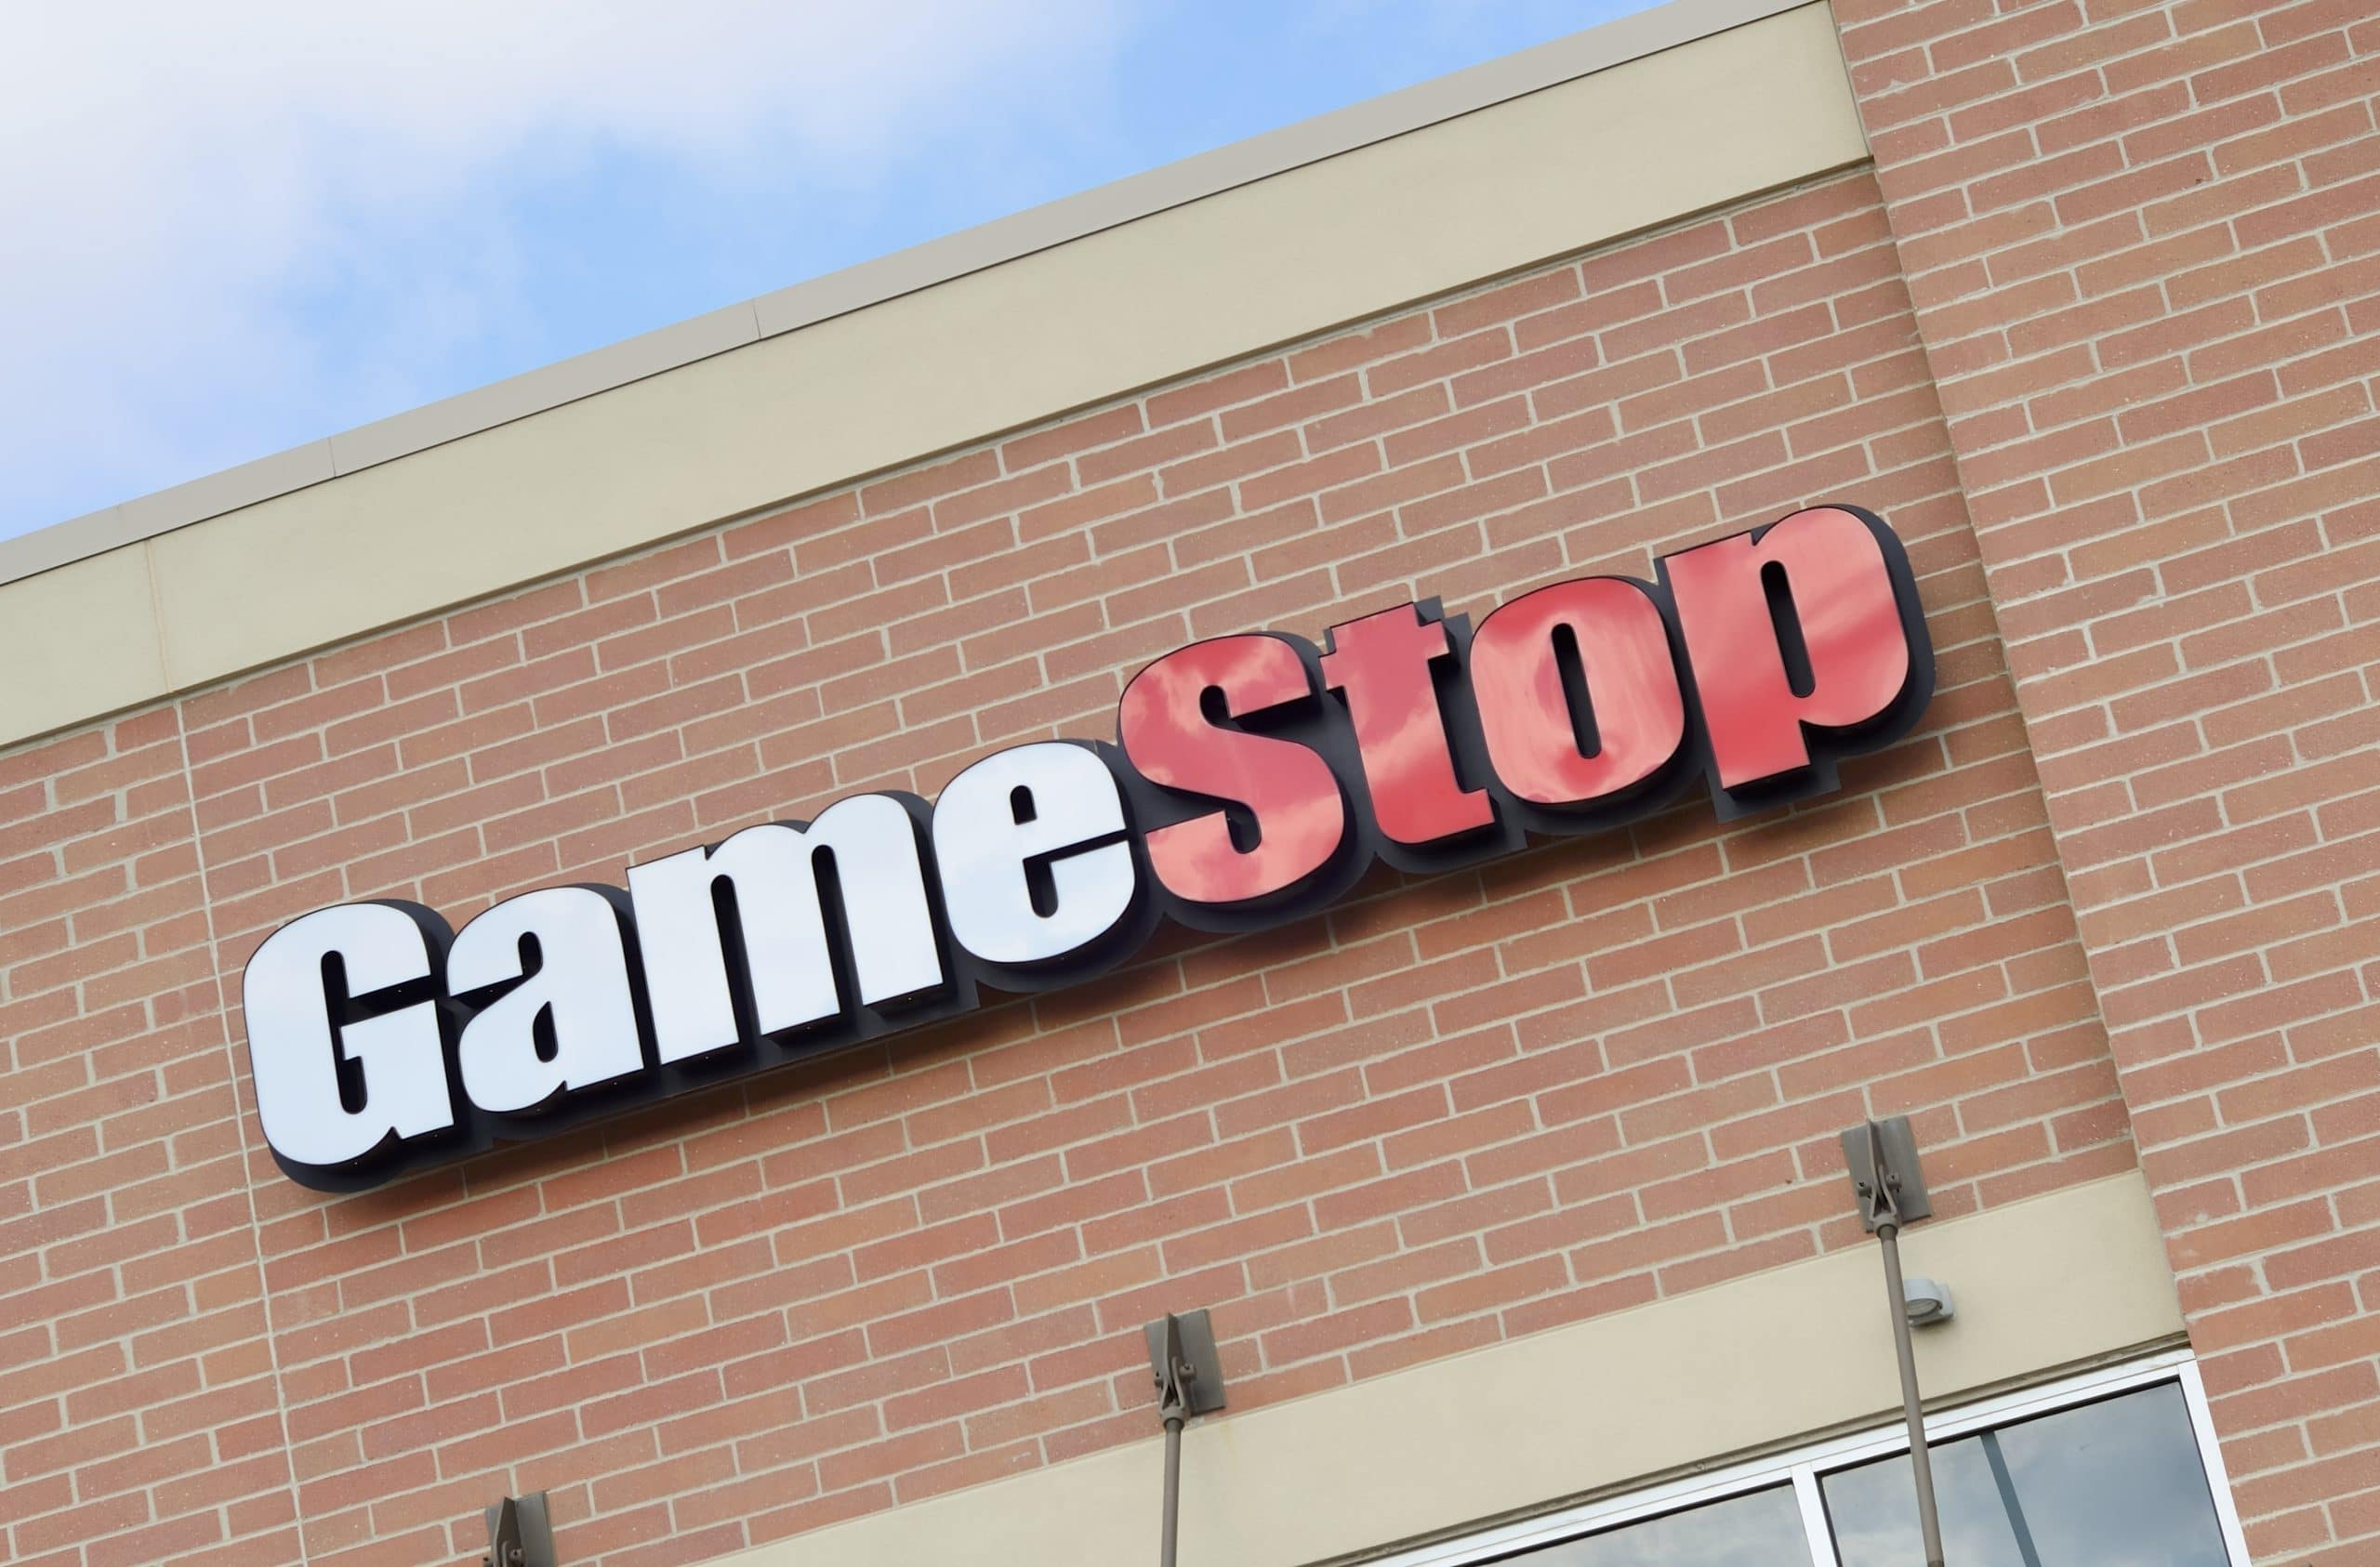 GameStop Names New CEO, CFO